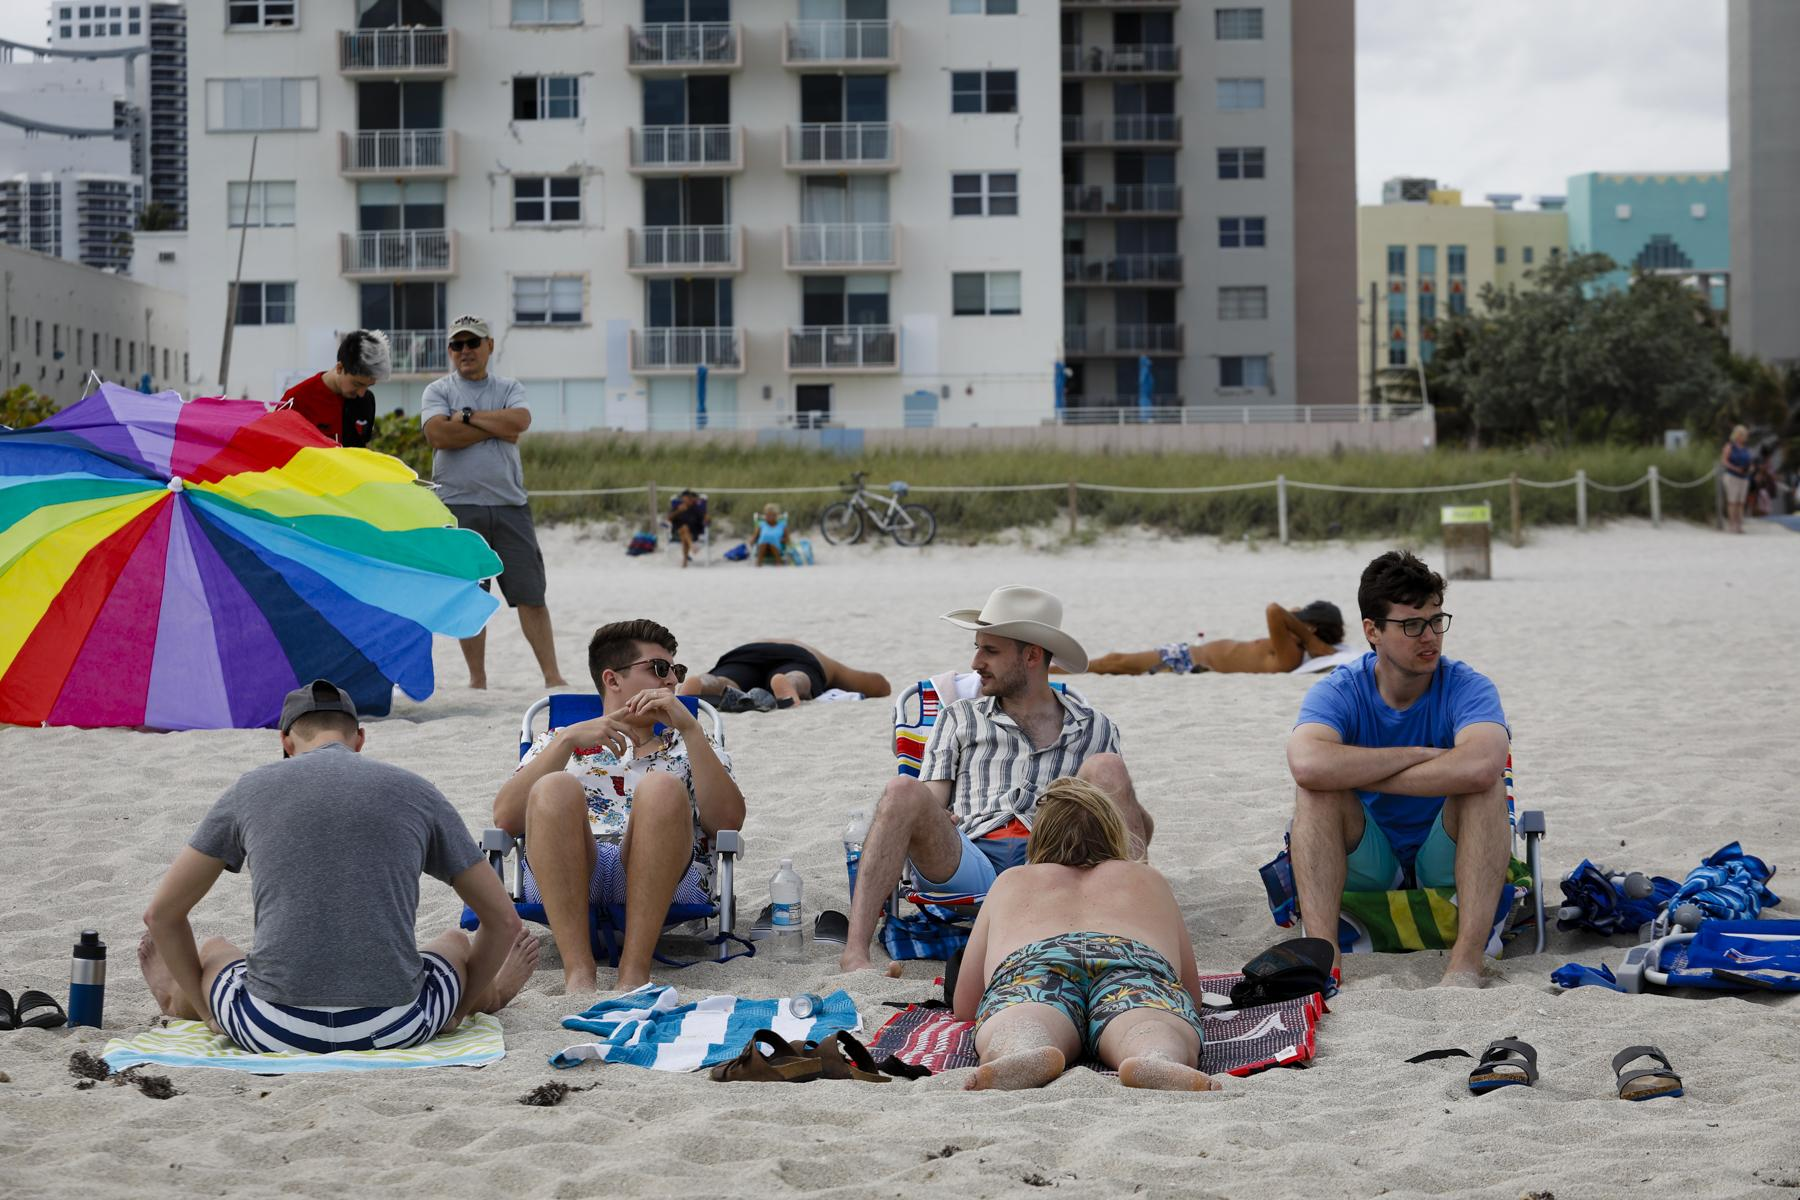 People sit on the beach during Spring Break in Miami Beach, Florida, U.S., on Saturday, March 6, 2021. Photographer: Eva Marie Uzcategui/Bloomberg